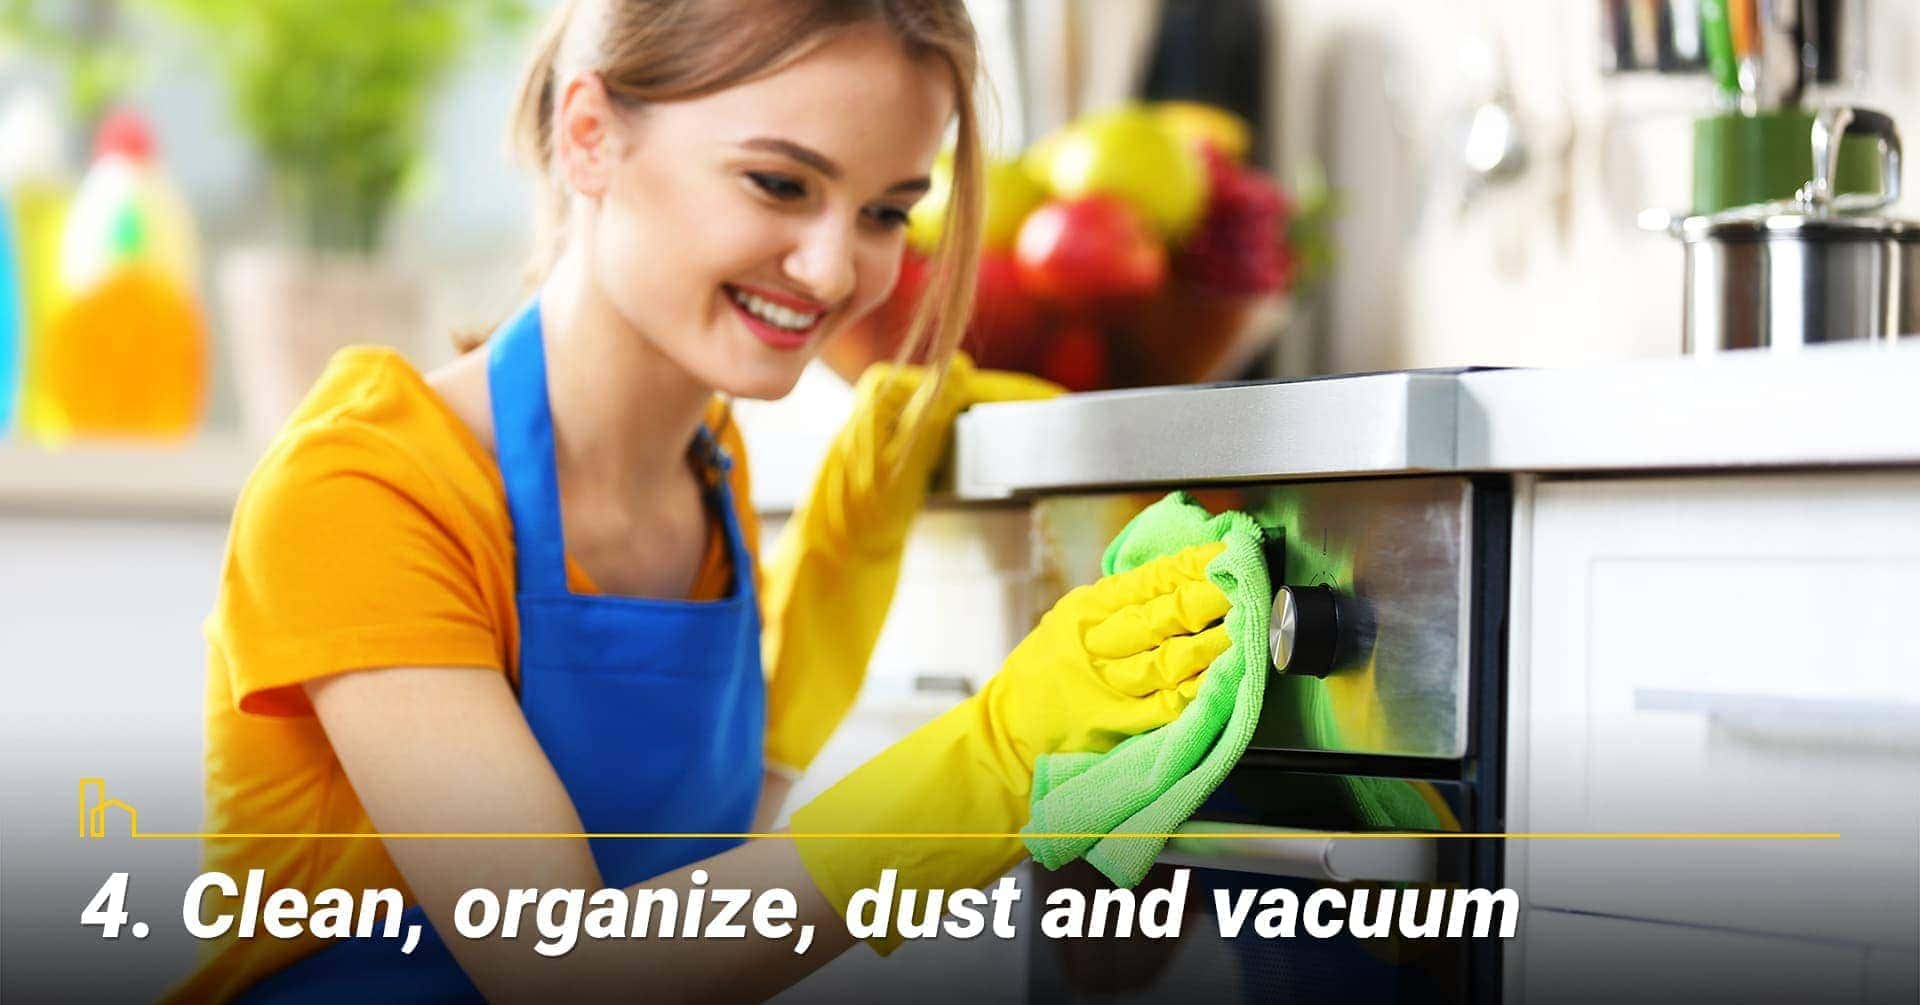 Clean, organize, dust and vacuum